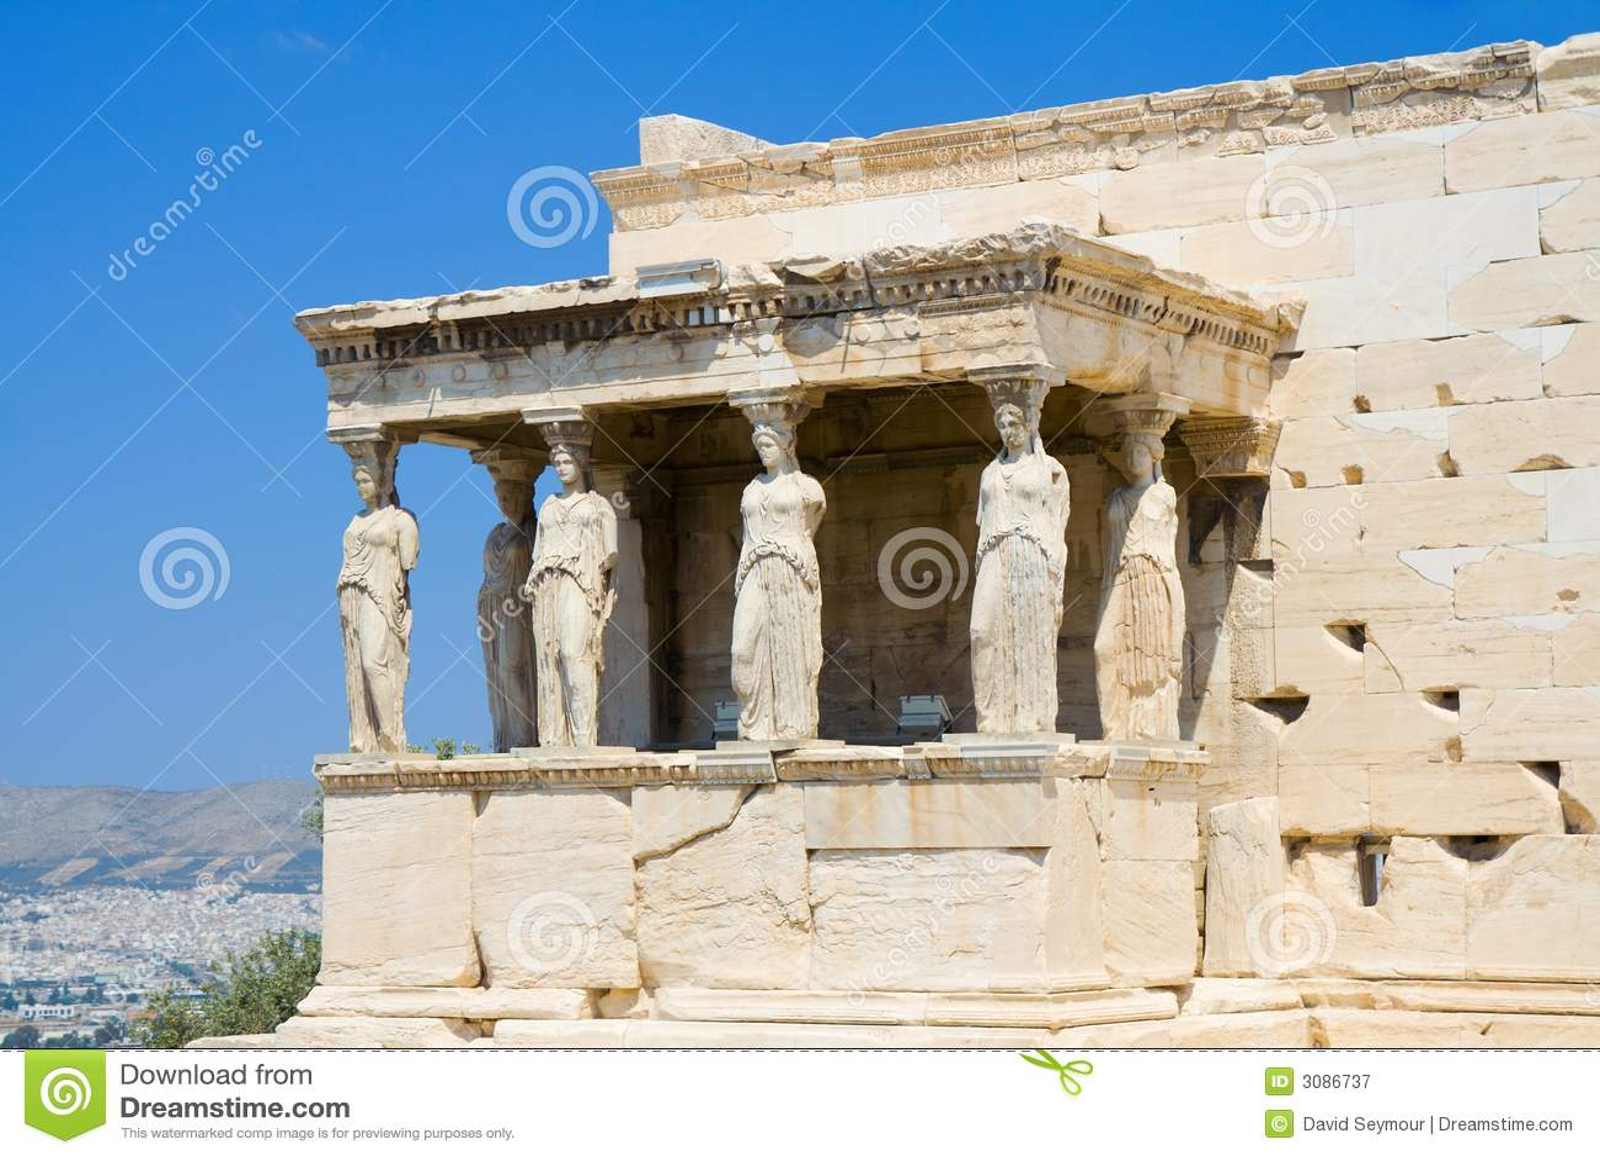 Caryatids at Athens